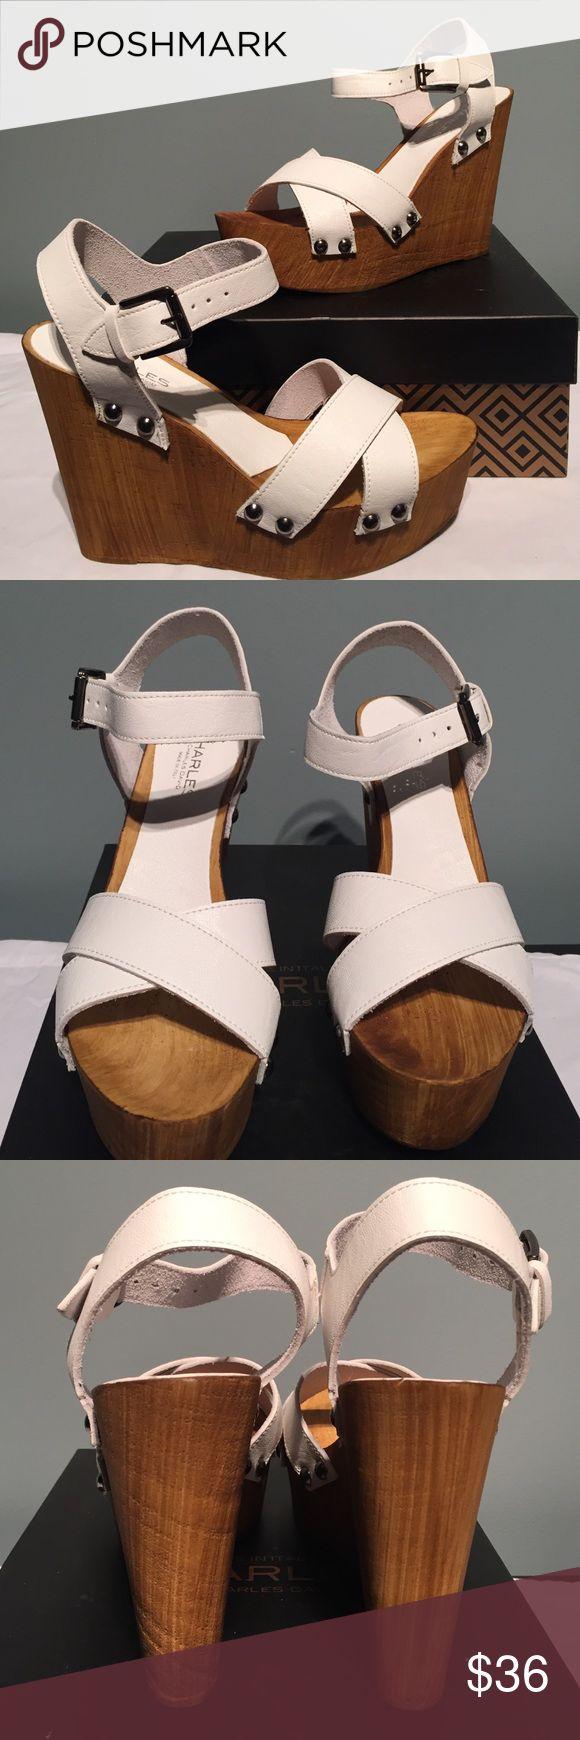 🎈NIB Charles by Charles David leather wedge🎈 NIB leather wedge.  Heel is 4 3/4.  Thanks for looking! Charles David Shoes Heels